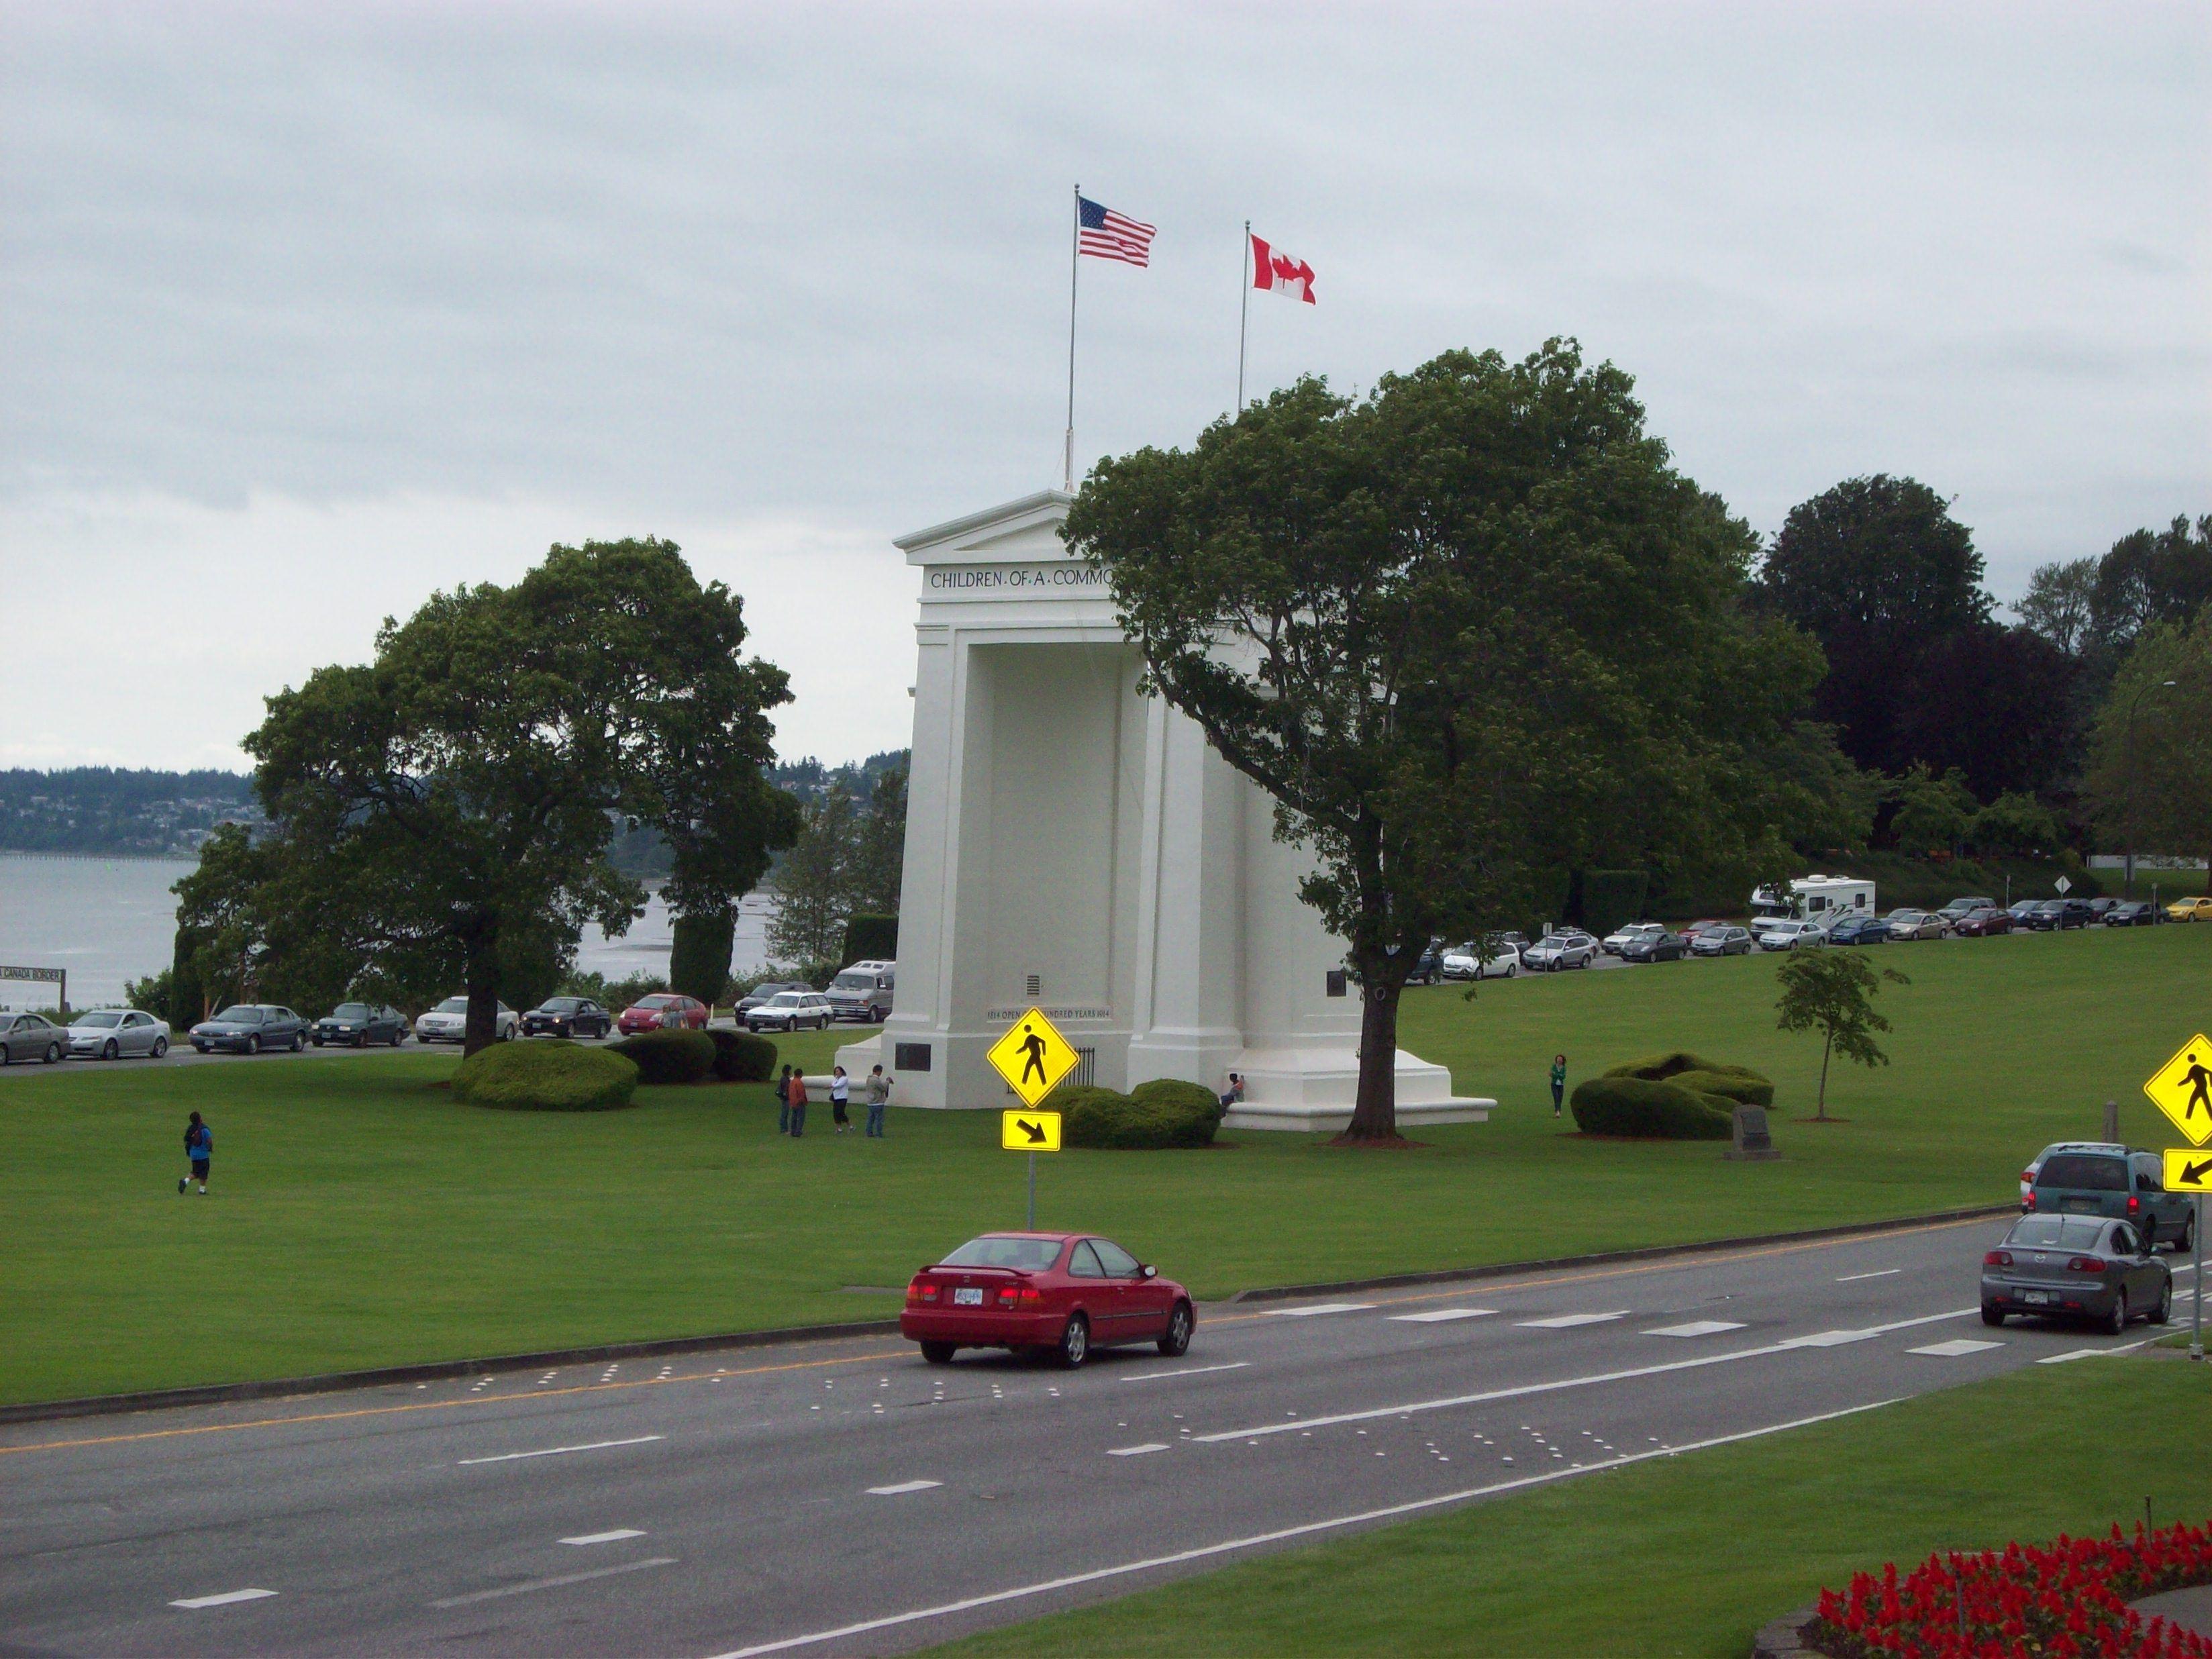 Peace Arch Park Blaine Wa Us Canada Border Crossing Arches Park Places To Travel Favorite Places